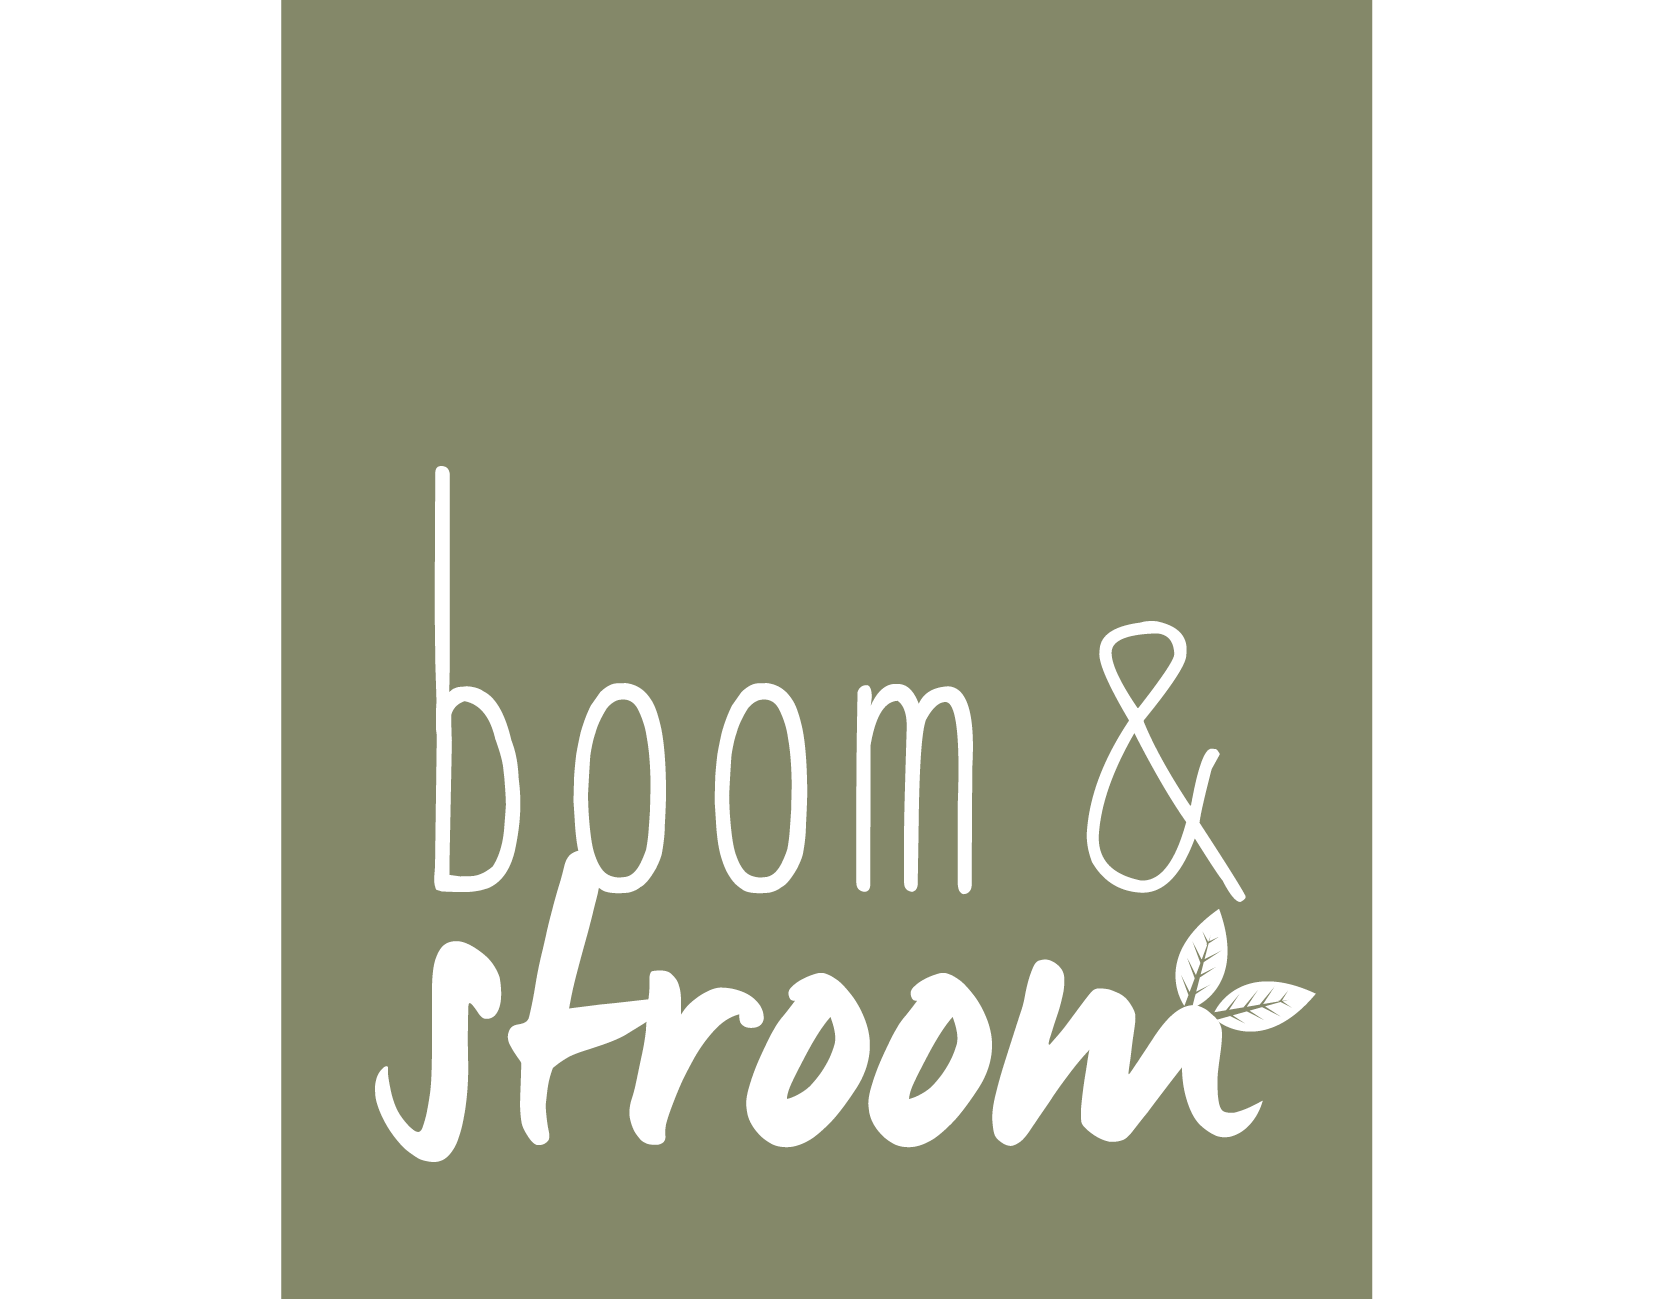 Boom en Stroom